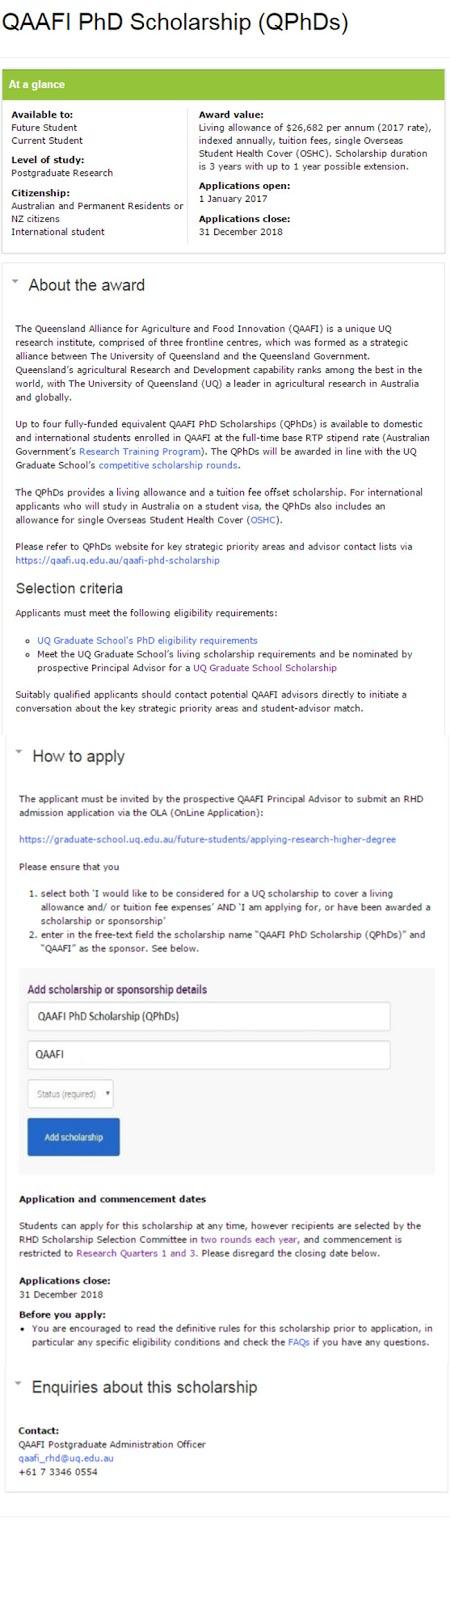 QAAFI PhD Scholarships for International Students at UQ in Australia